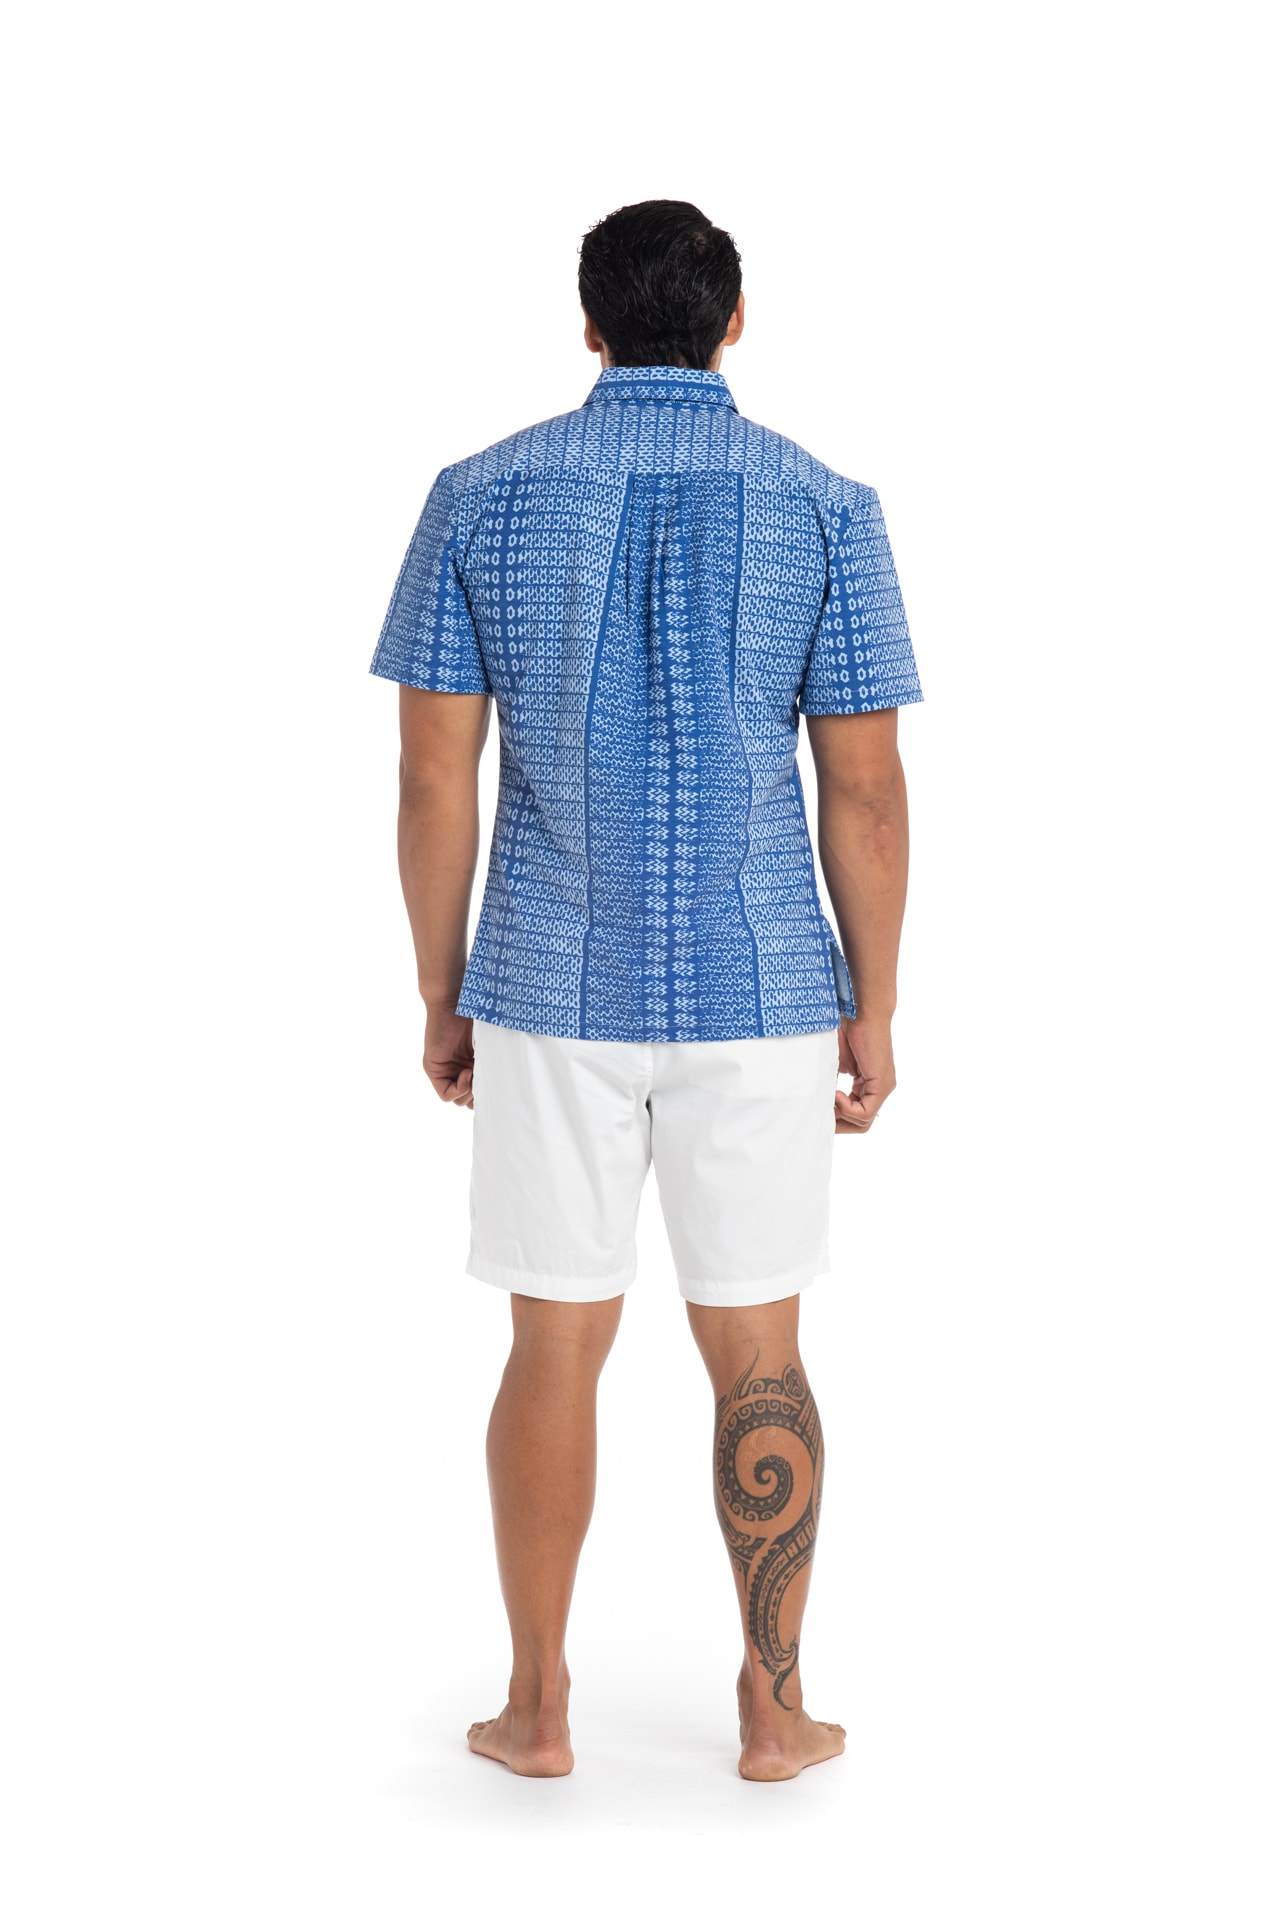 Male model wearing Mahalo Nui Shirt in Blue AkoaAkoa - Back View